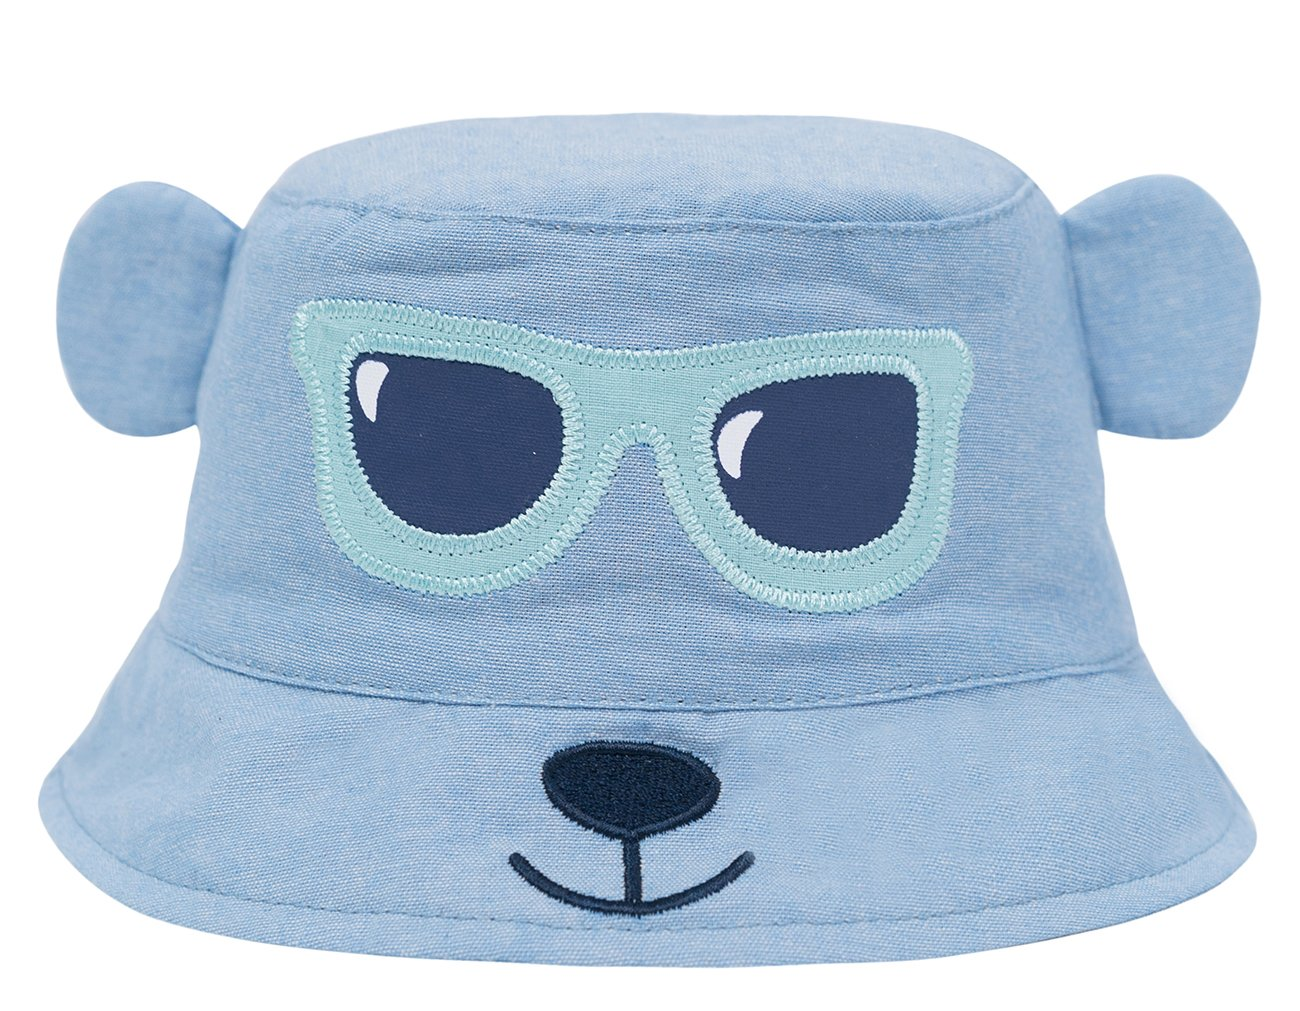 Eriso Baby Toddler Kids Breathable Sun Hat Animal Bucket, Stay-On ((20.5'') 2-4 Years, Blue Bear)